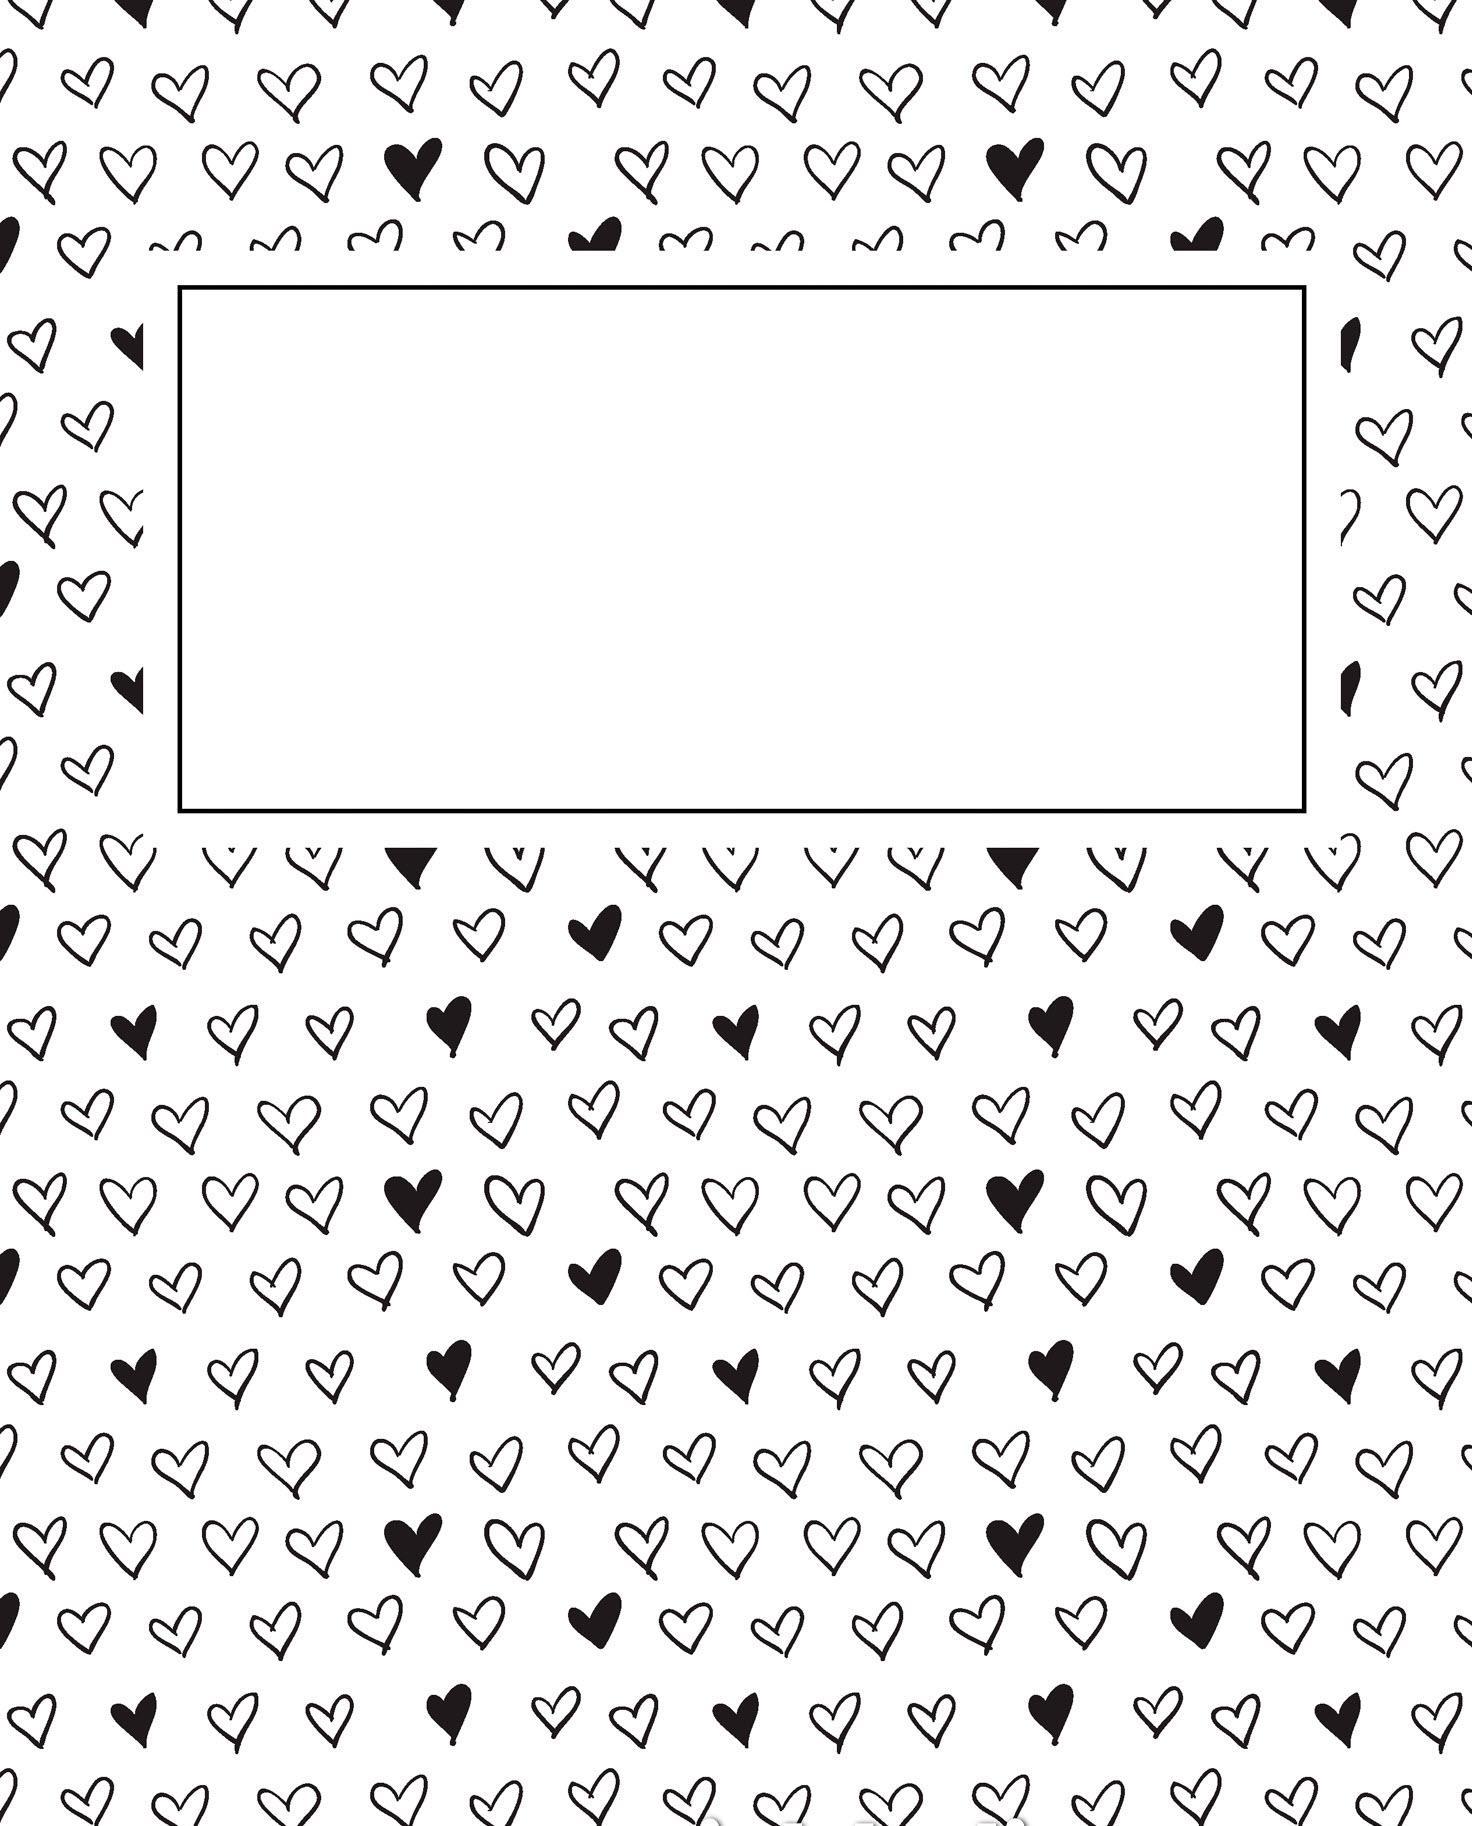 раскраска антистресс обложка на тетрадь сердечки